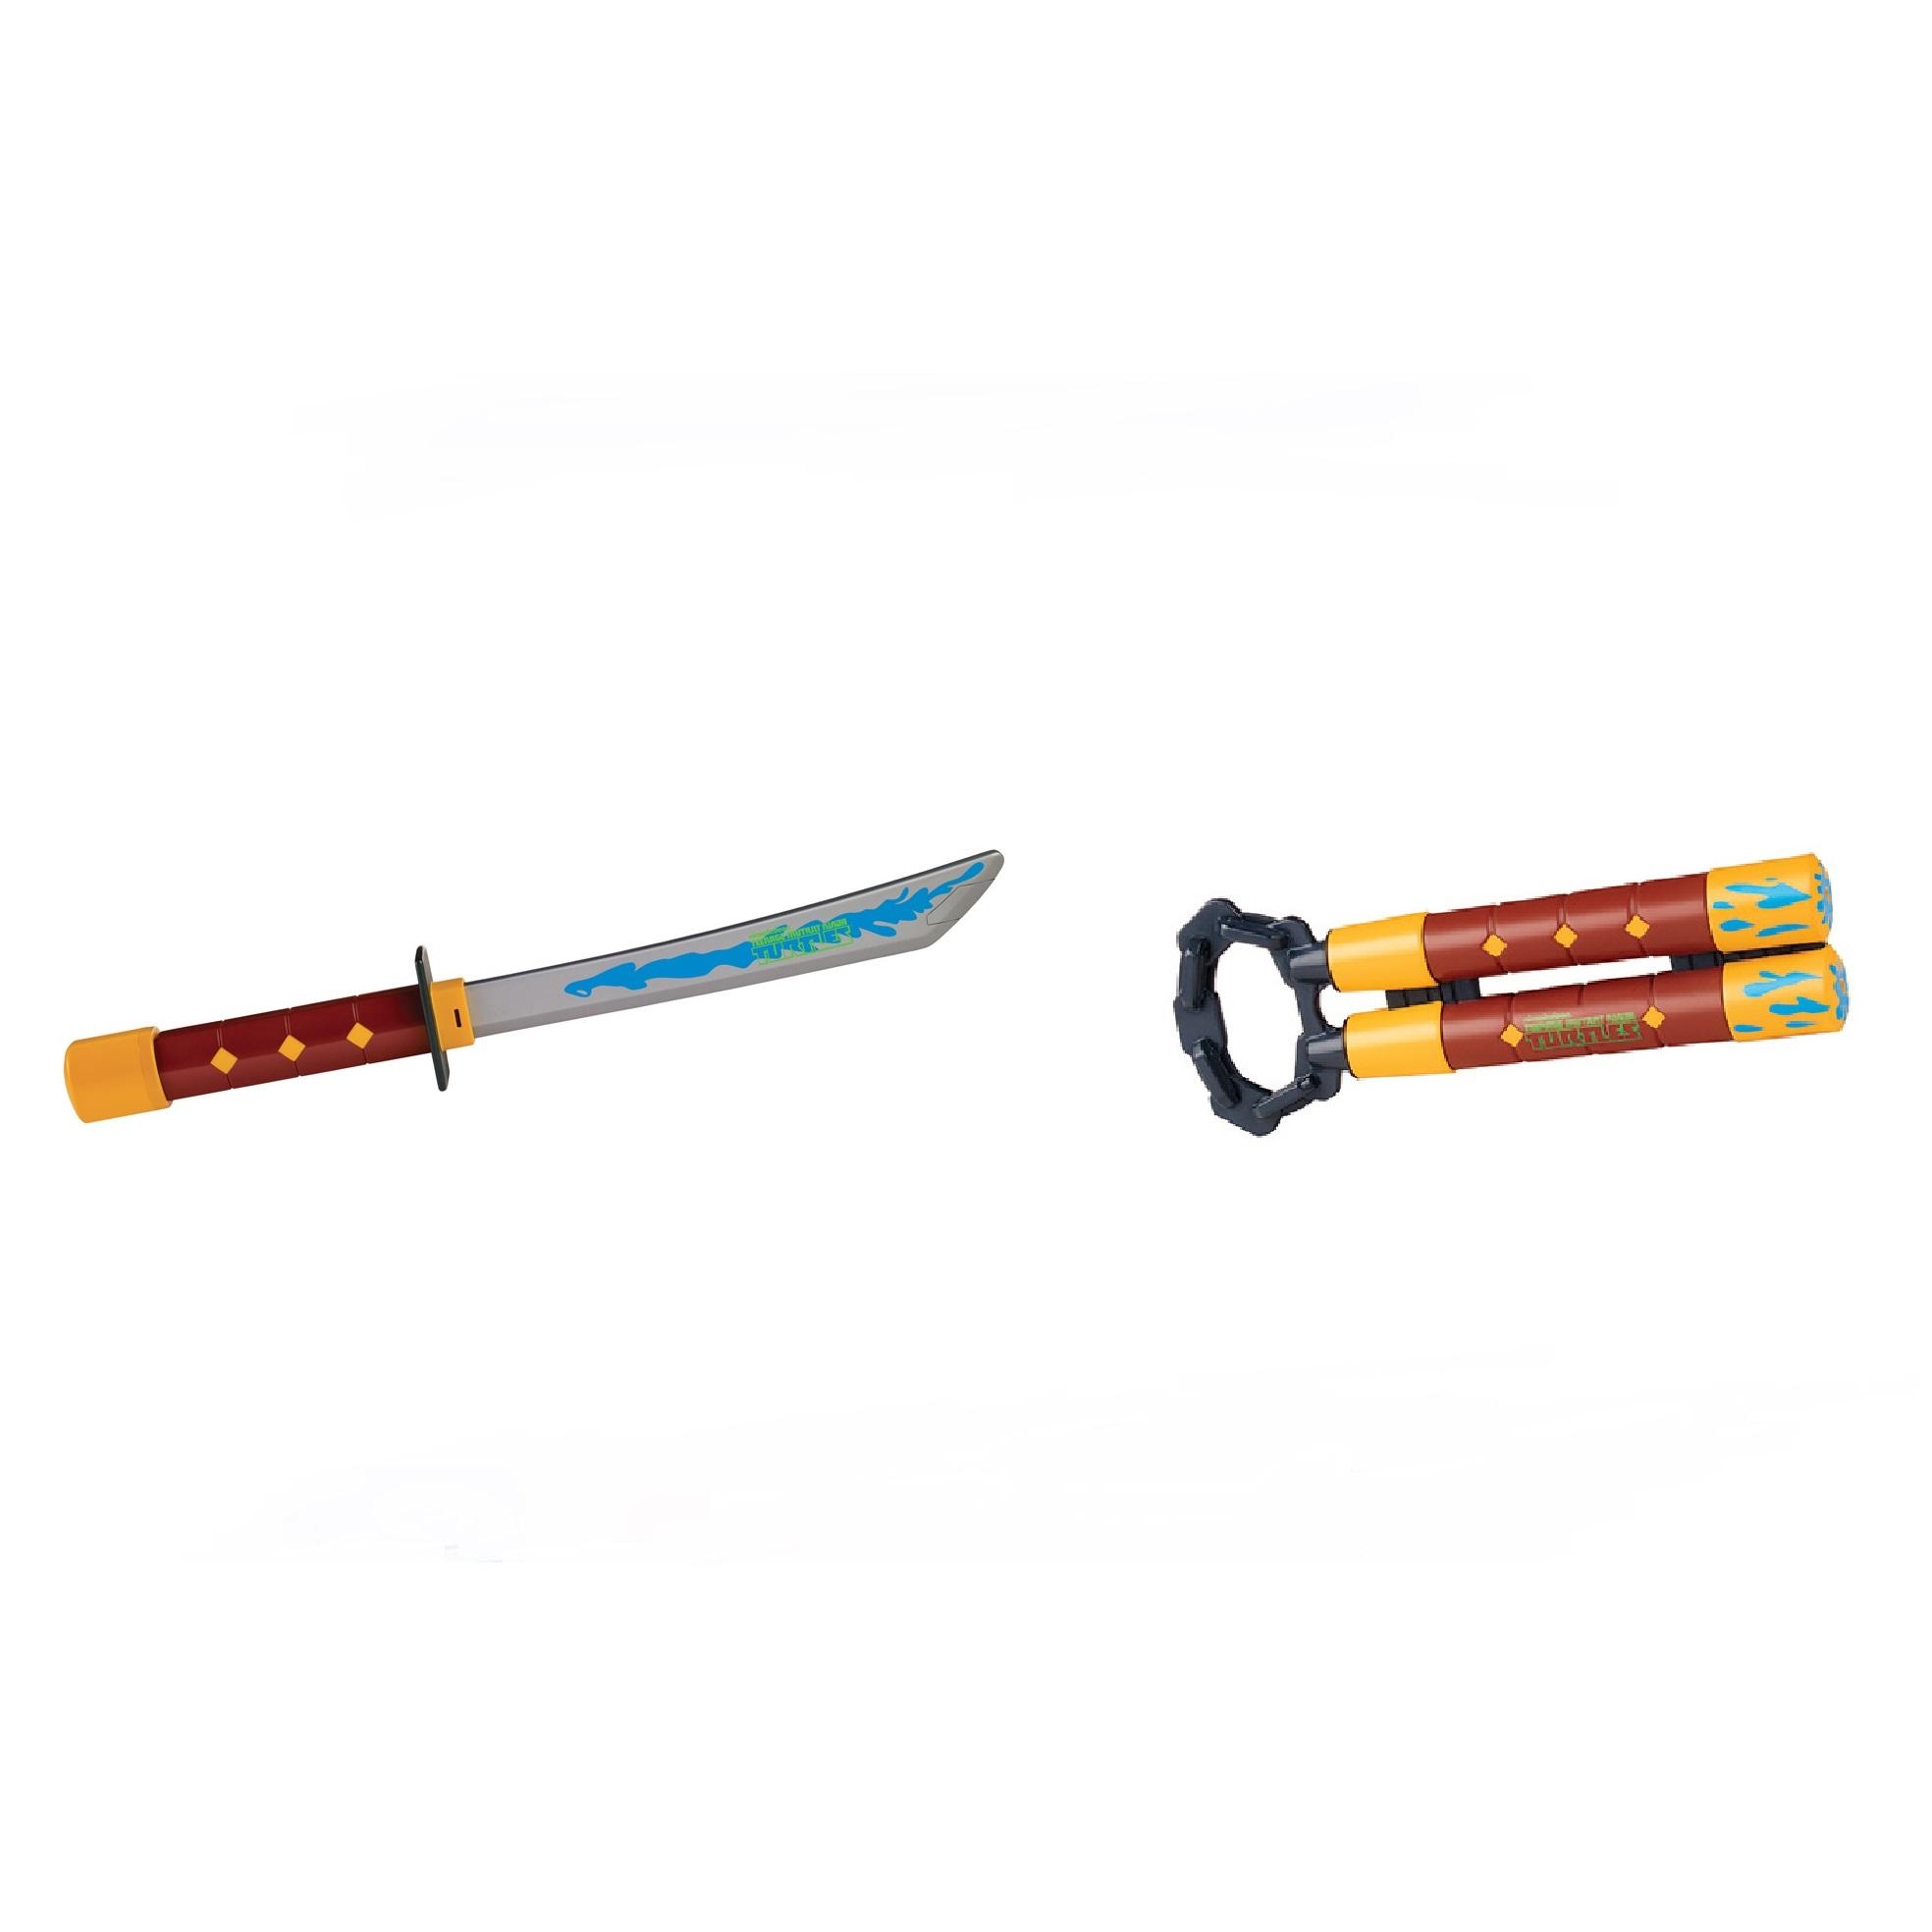 Картинки оружие черепашки ниндзя